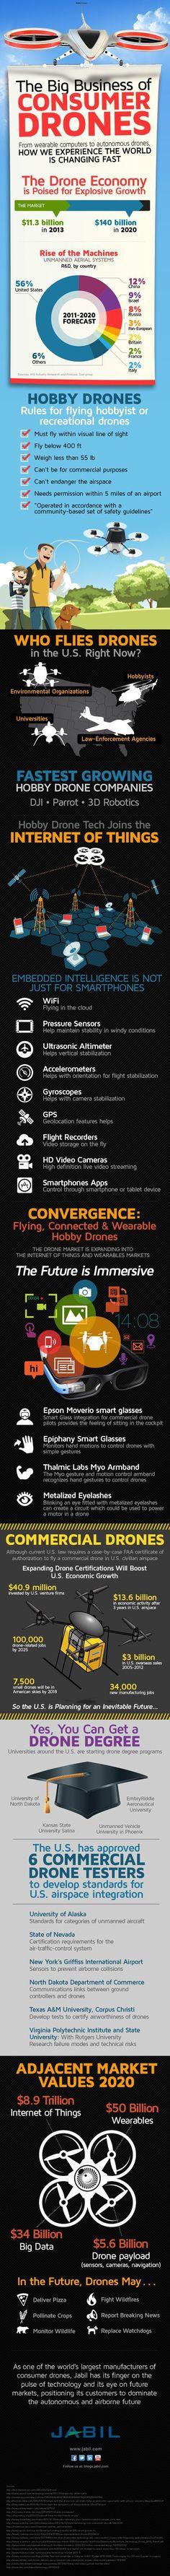 Drone Infographic | Drones, Quadcopters & UAV's  https://www.dynnexdrones.com/